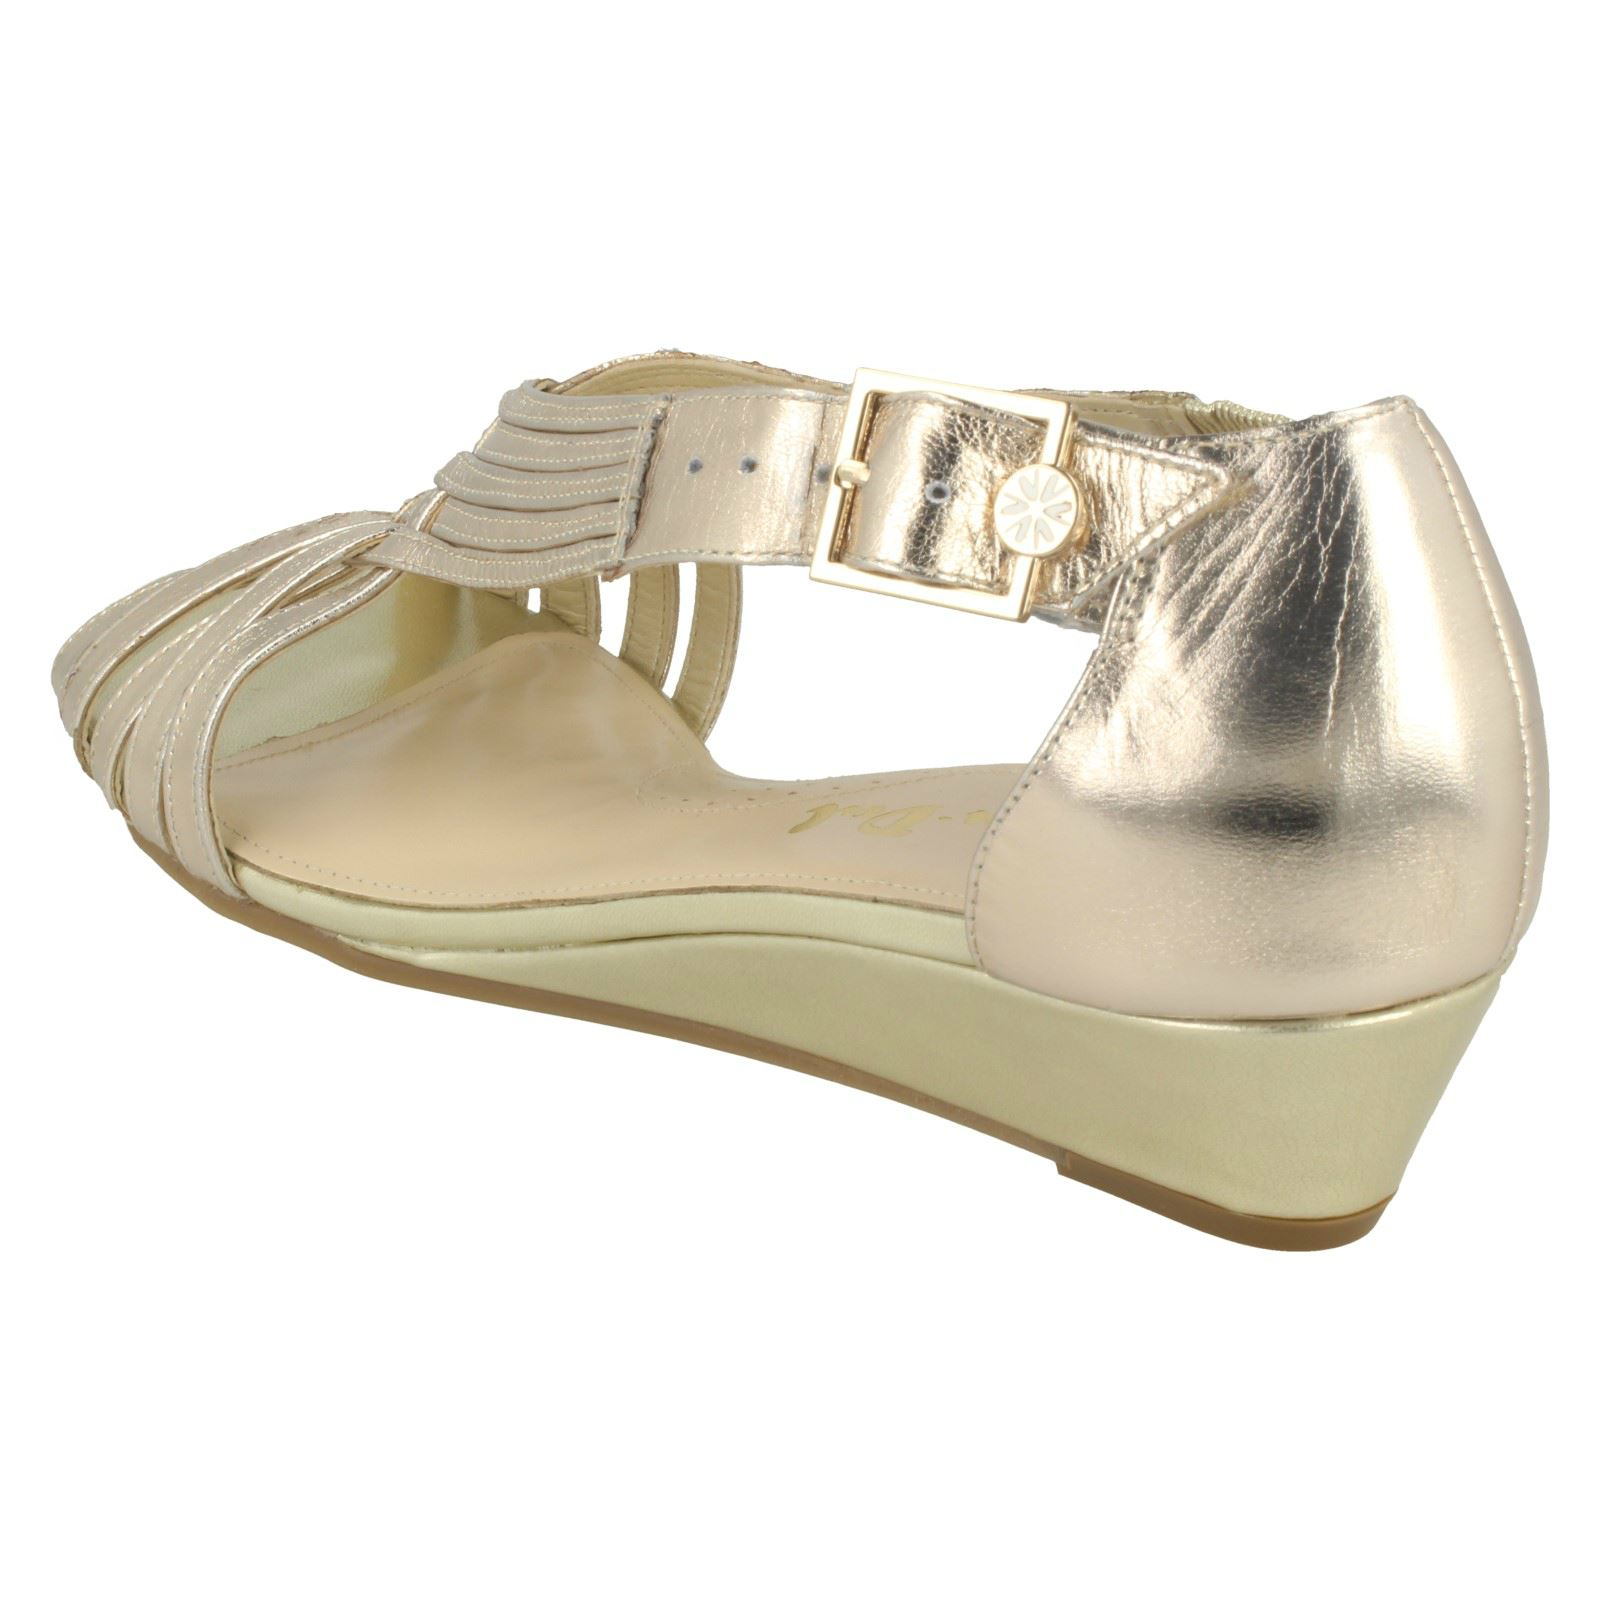 Ladies-Van-Dal-Wedge-Strappy-Sandals-Lucie thumbnail 28